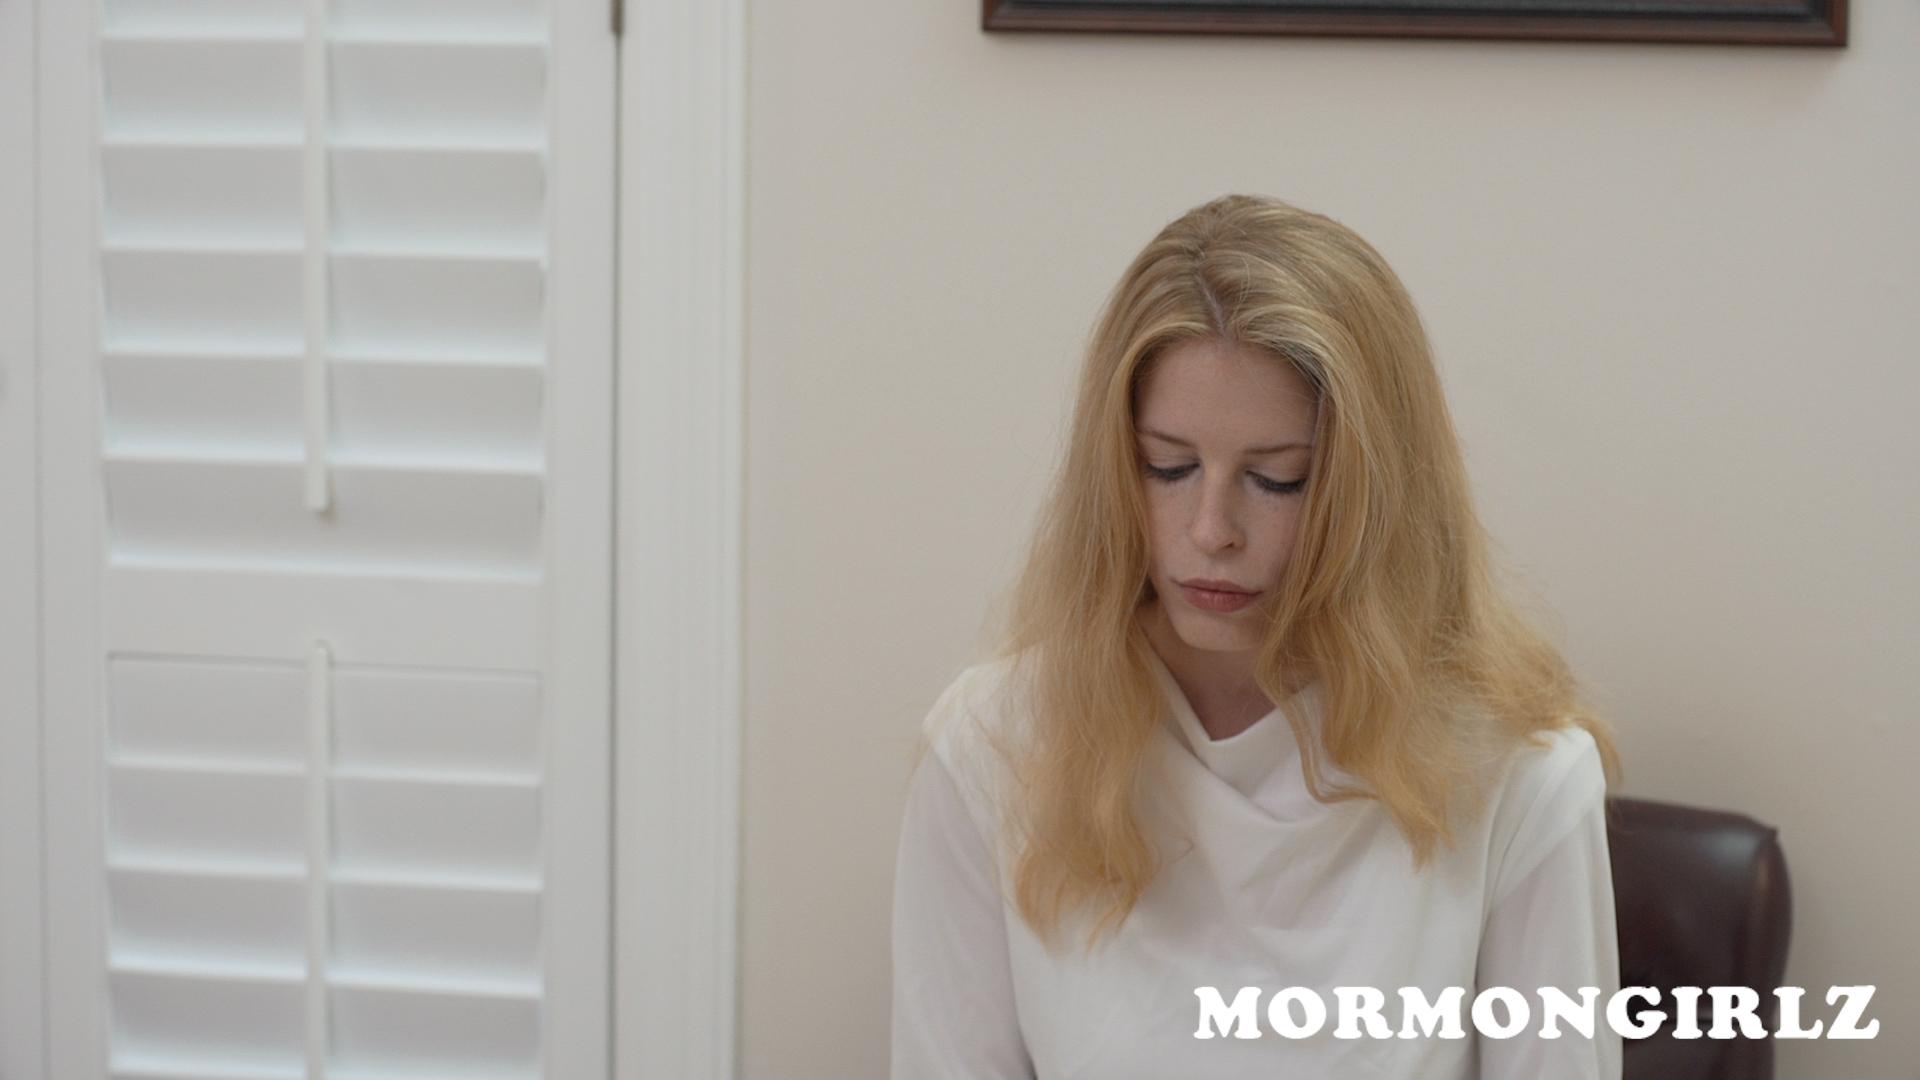 mormongirlz_70b_02